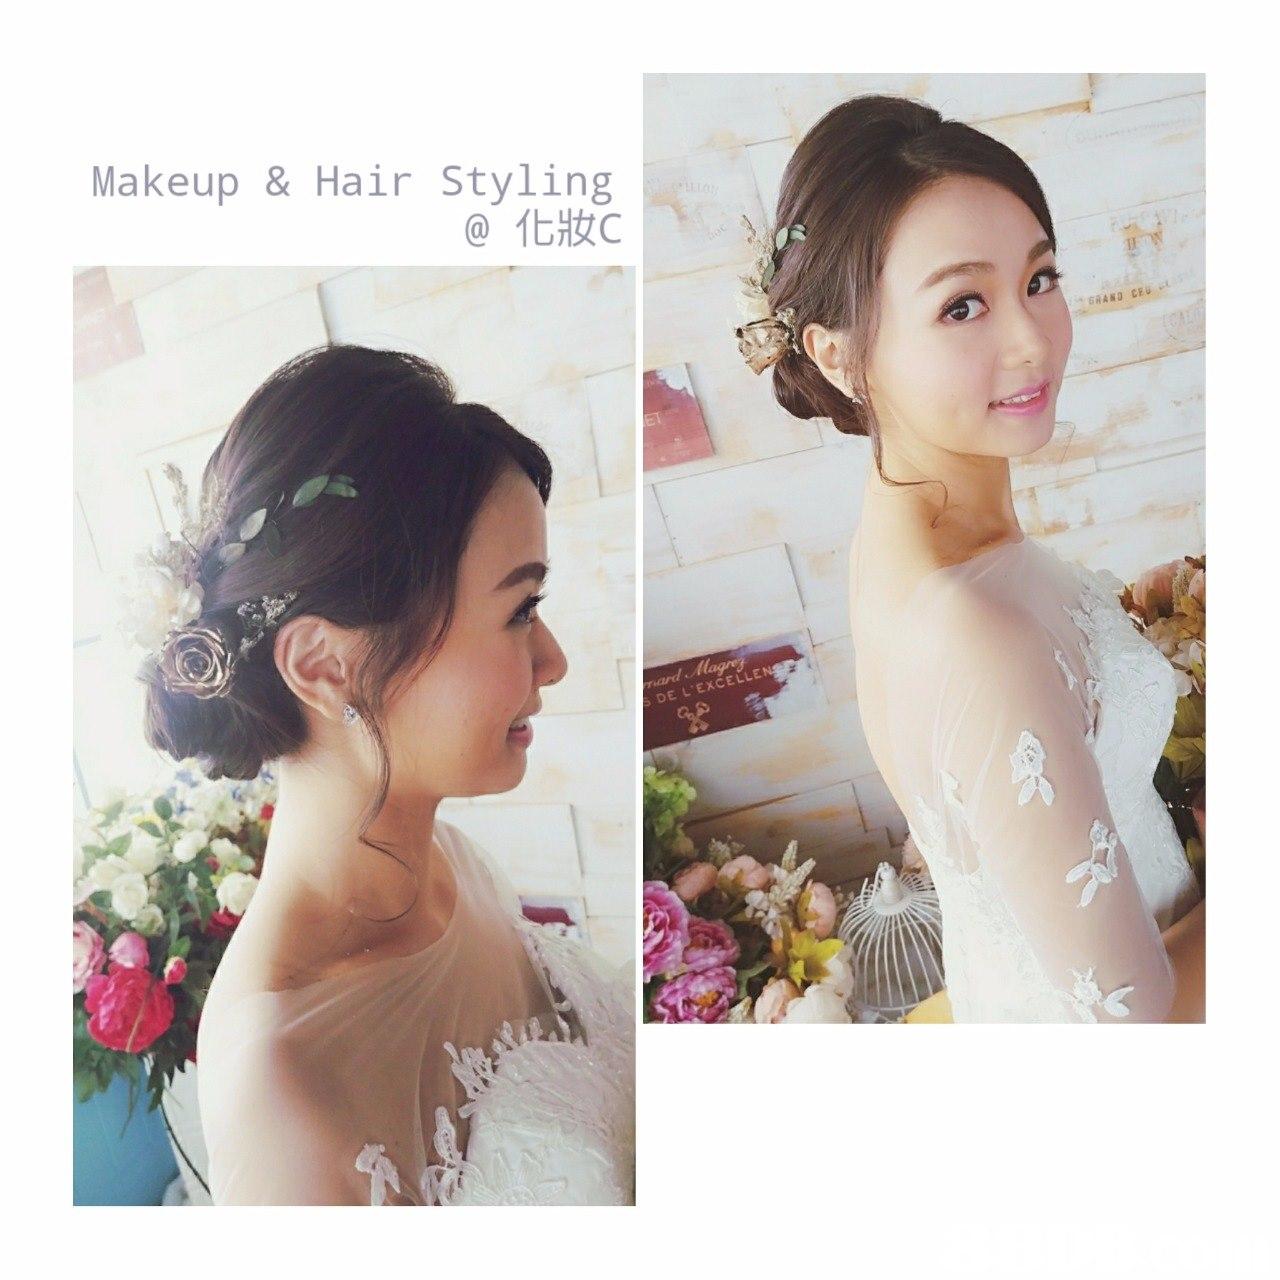 Makeup & Hair Styling @化妝c GRAND CEU EXCELL DE L,hair,bride,hair accessory,flower,hairstyle